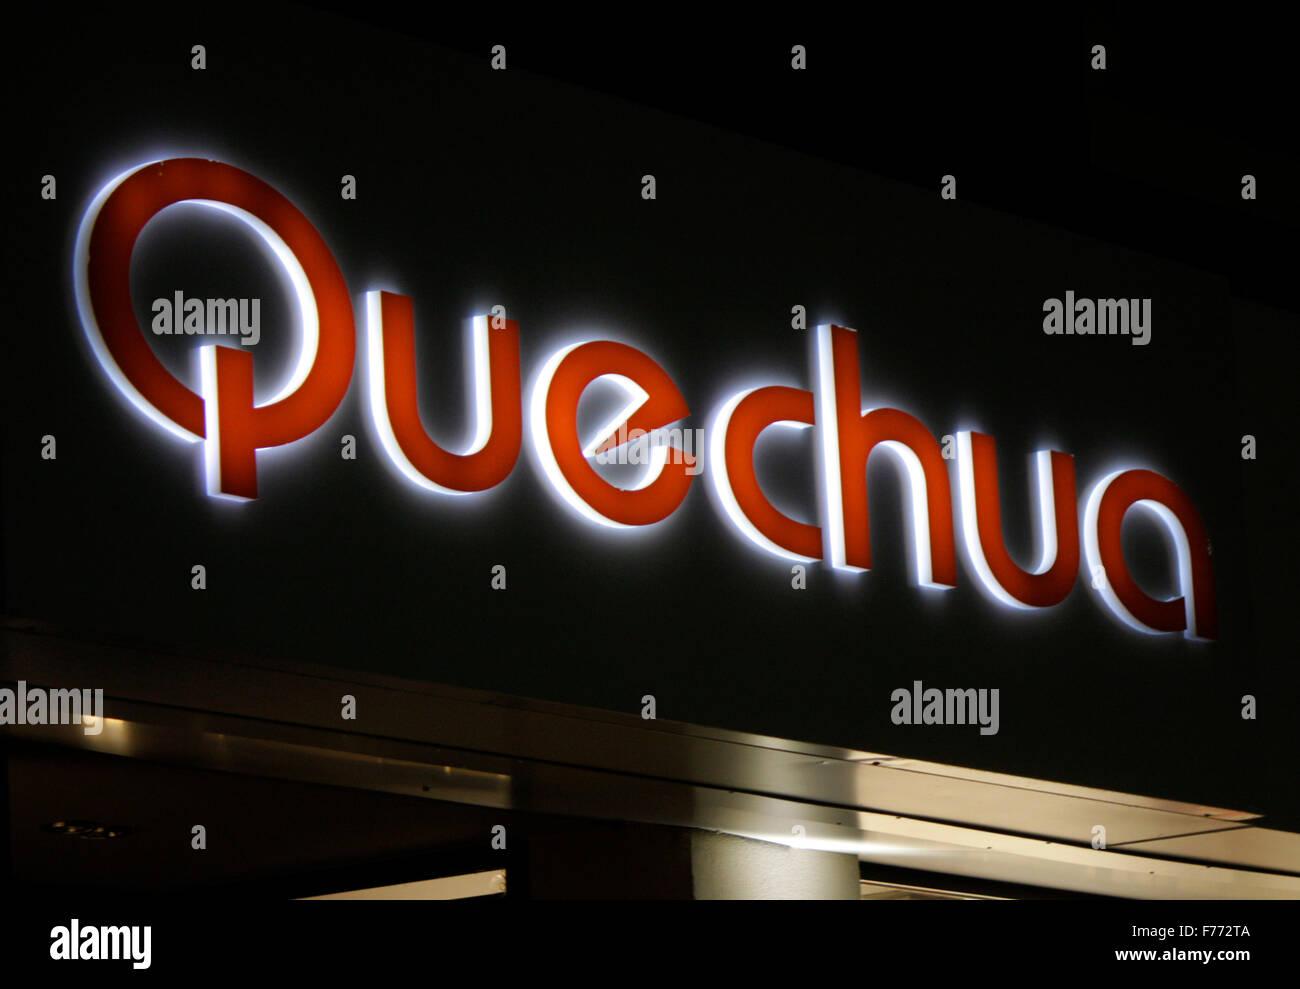 Markennamen: 'Quechua', Chamonix, Frankrfeich. - Stock Image